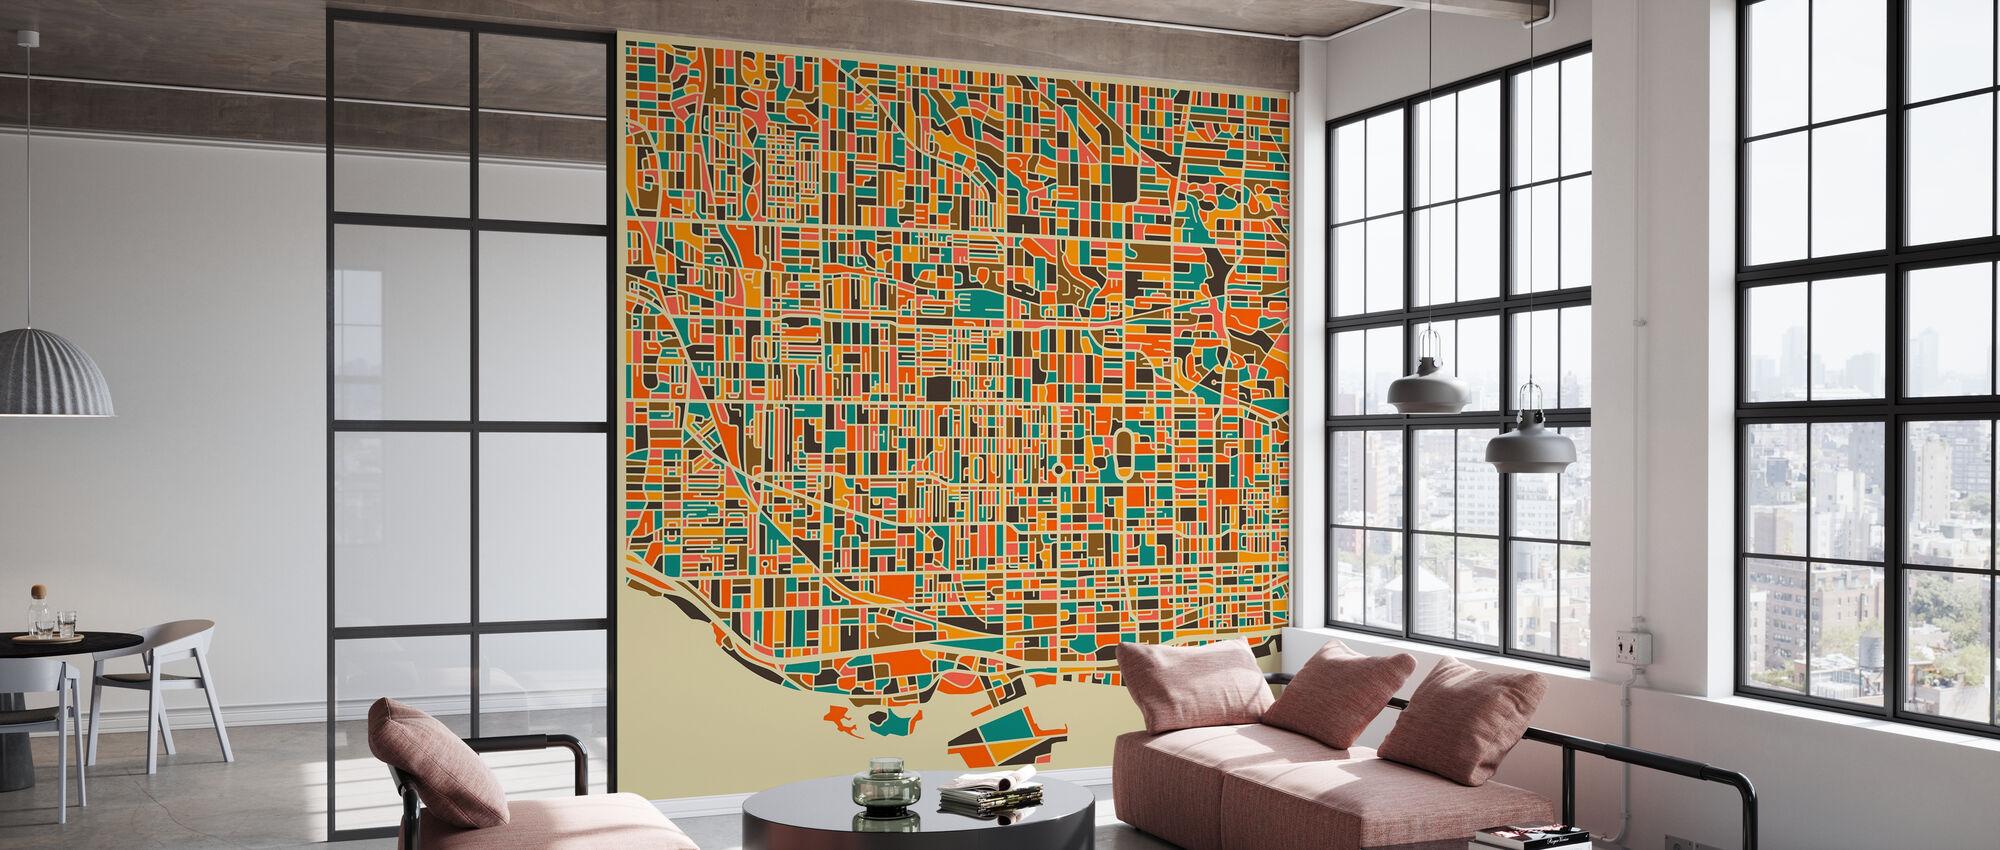 Multicolor Map - Toronto - Wallpaper - Office